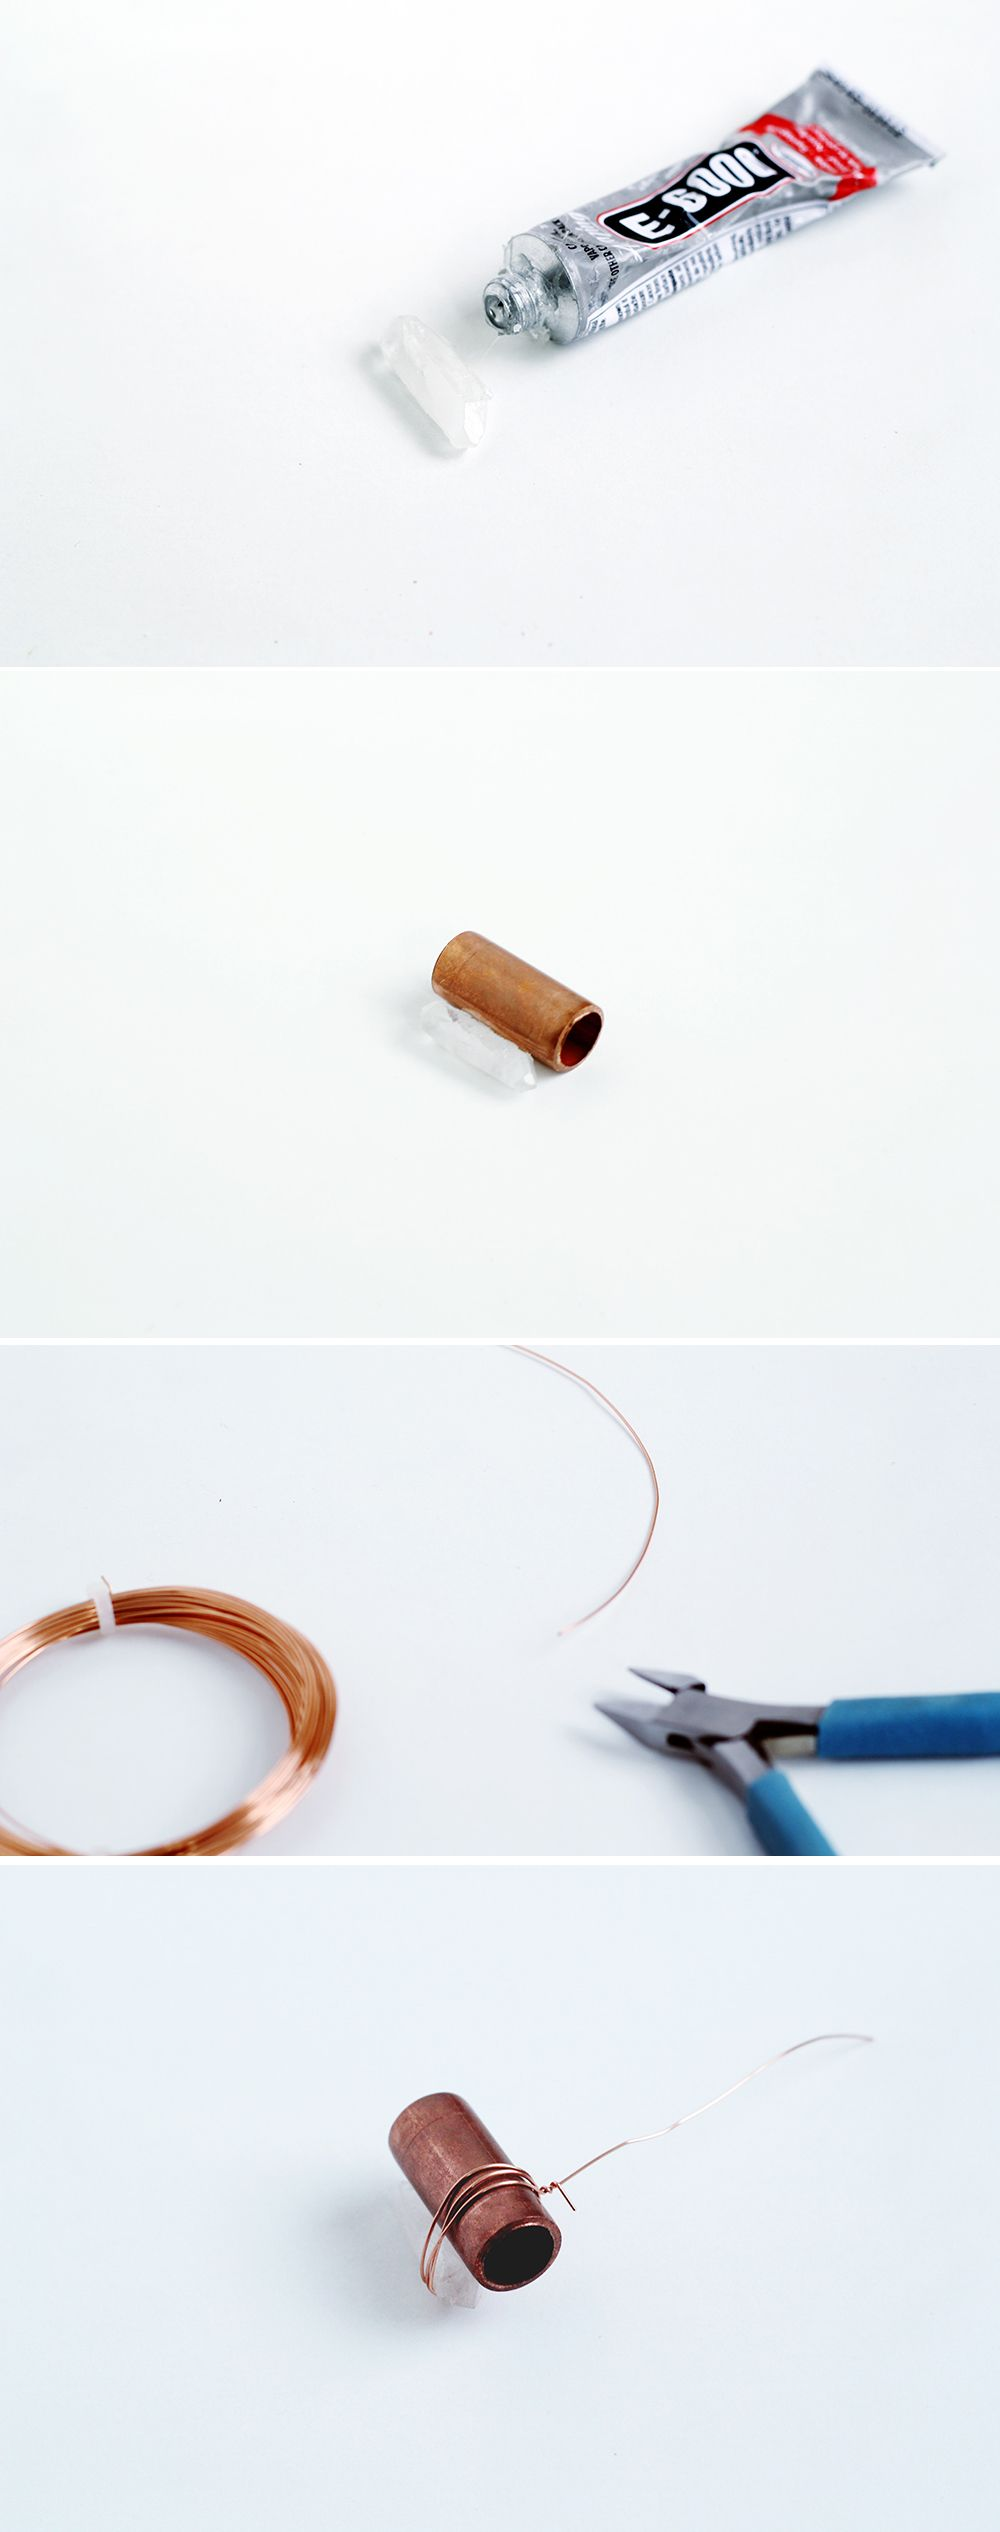 DIY Copper Pipe & Quartz Necklace | Fall For DIY